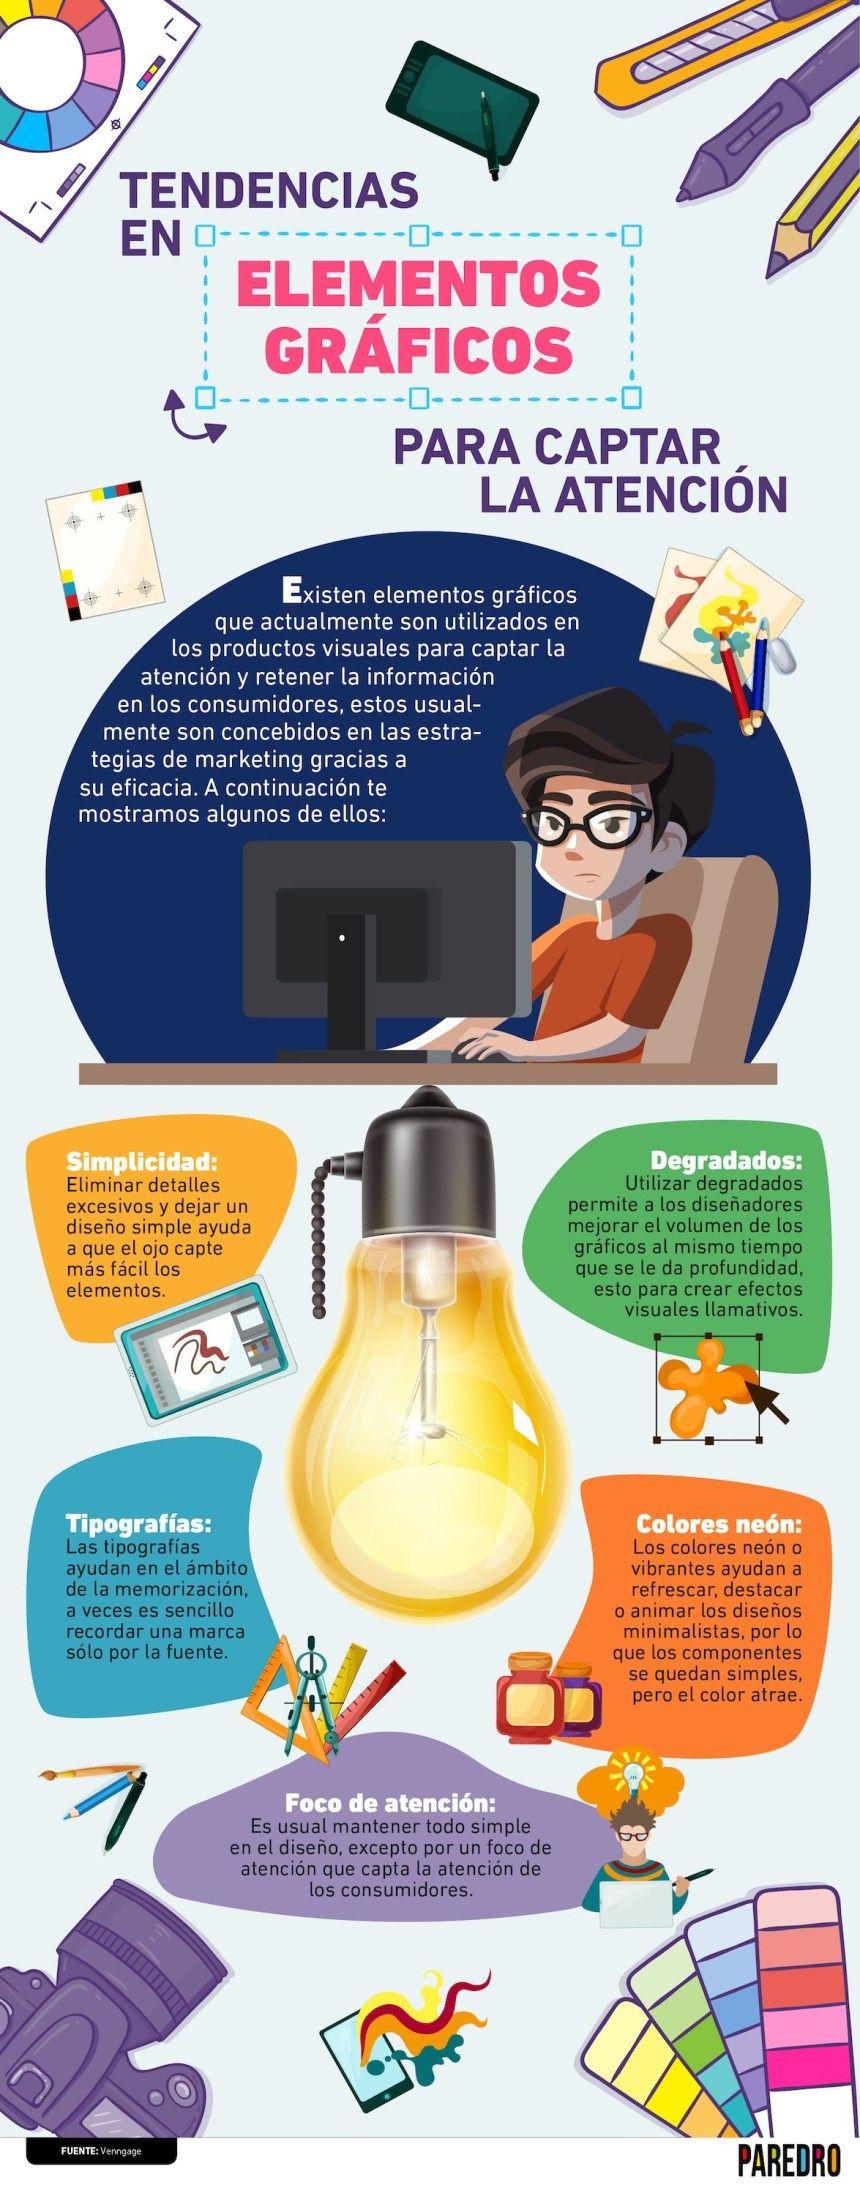 Tendencias En Elementos Gráficos Para Llamar La Atención Infografia Disenos De Unas Infografias Creativas Infografia